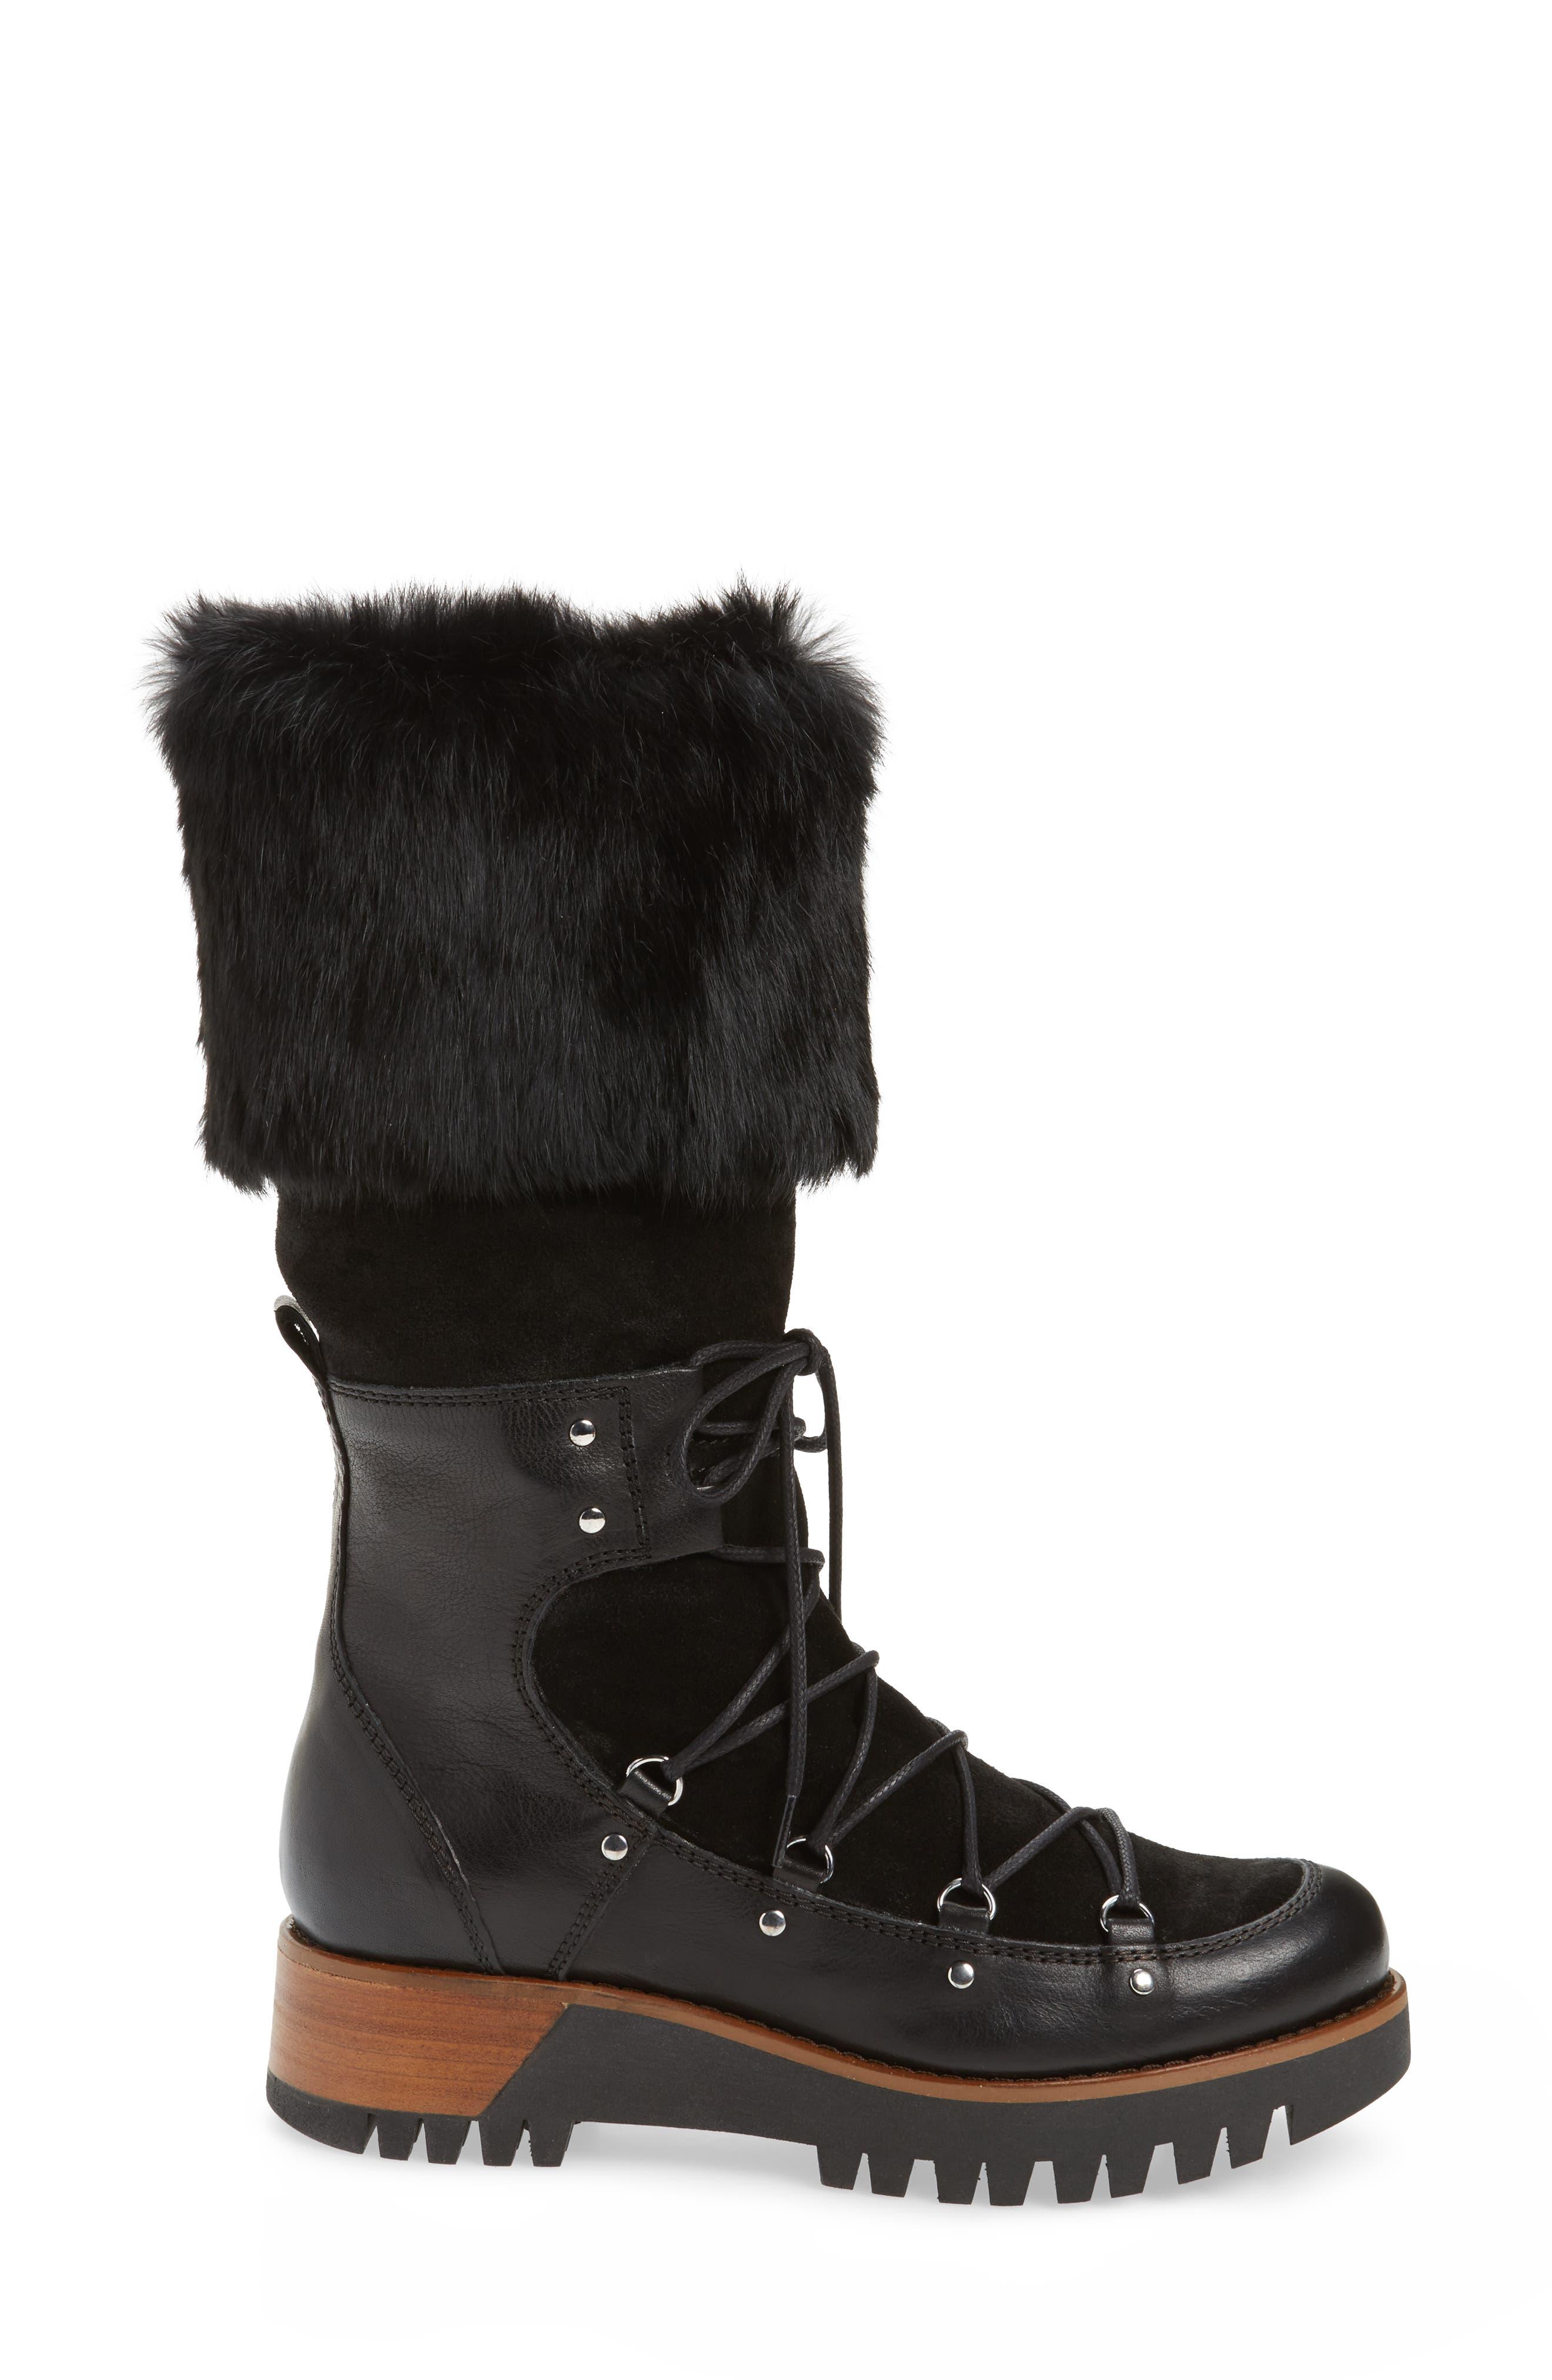 Tellurian Genuine Rabbit Fur Cuff Boot,                             Alternate thumbnail 3, color,                             Black Leather